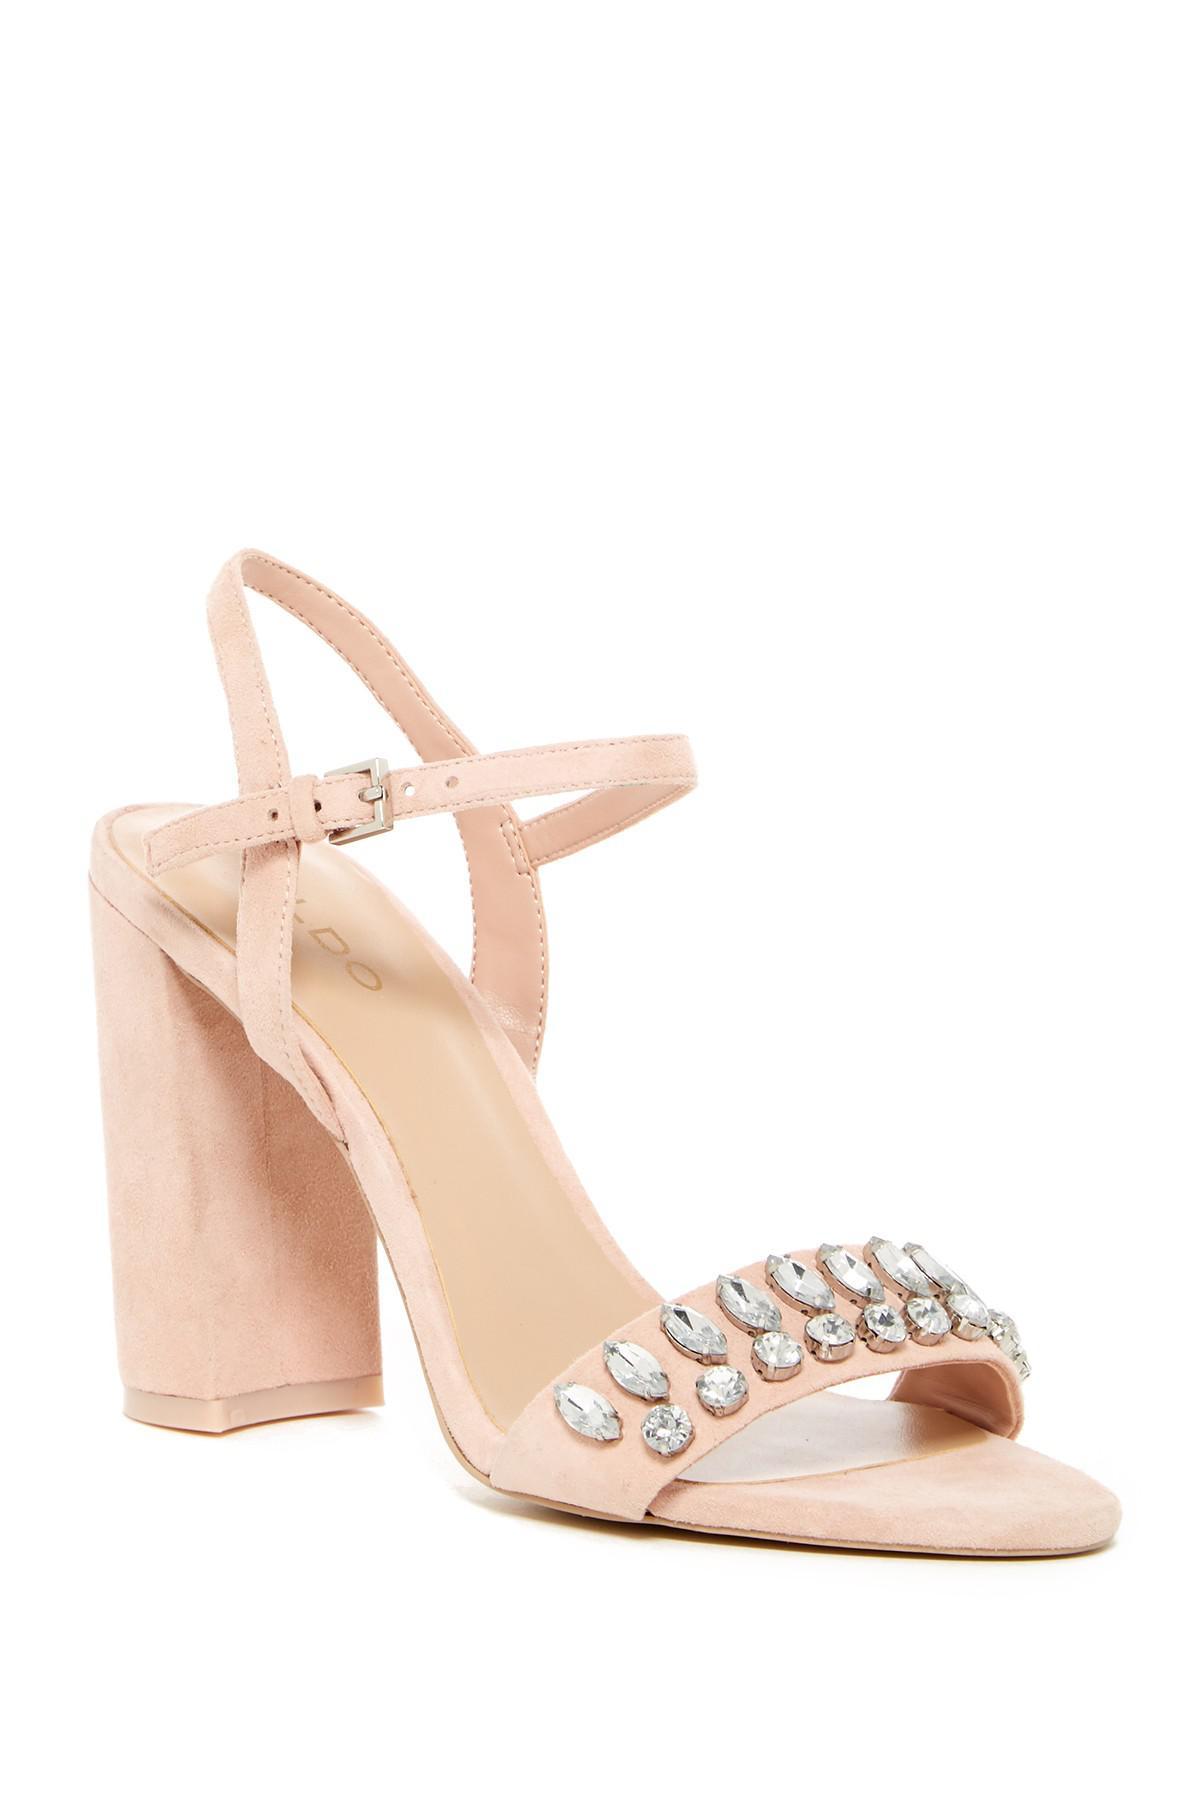 0ac09f8f215 Lyst - ALDO Viria Block Heel Sandal in Pink